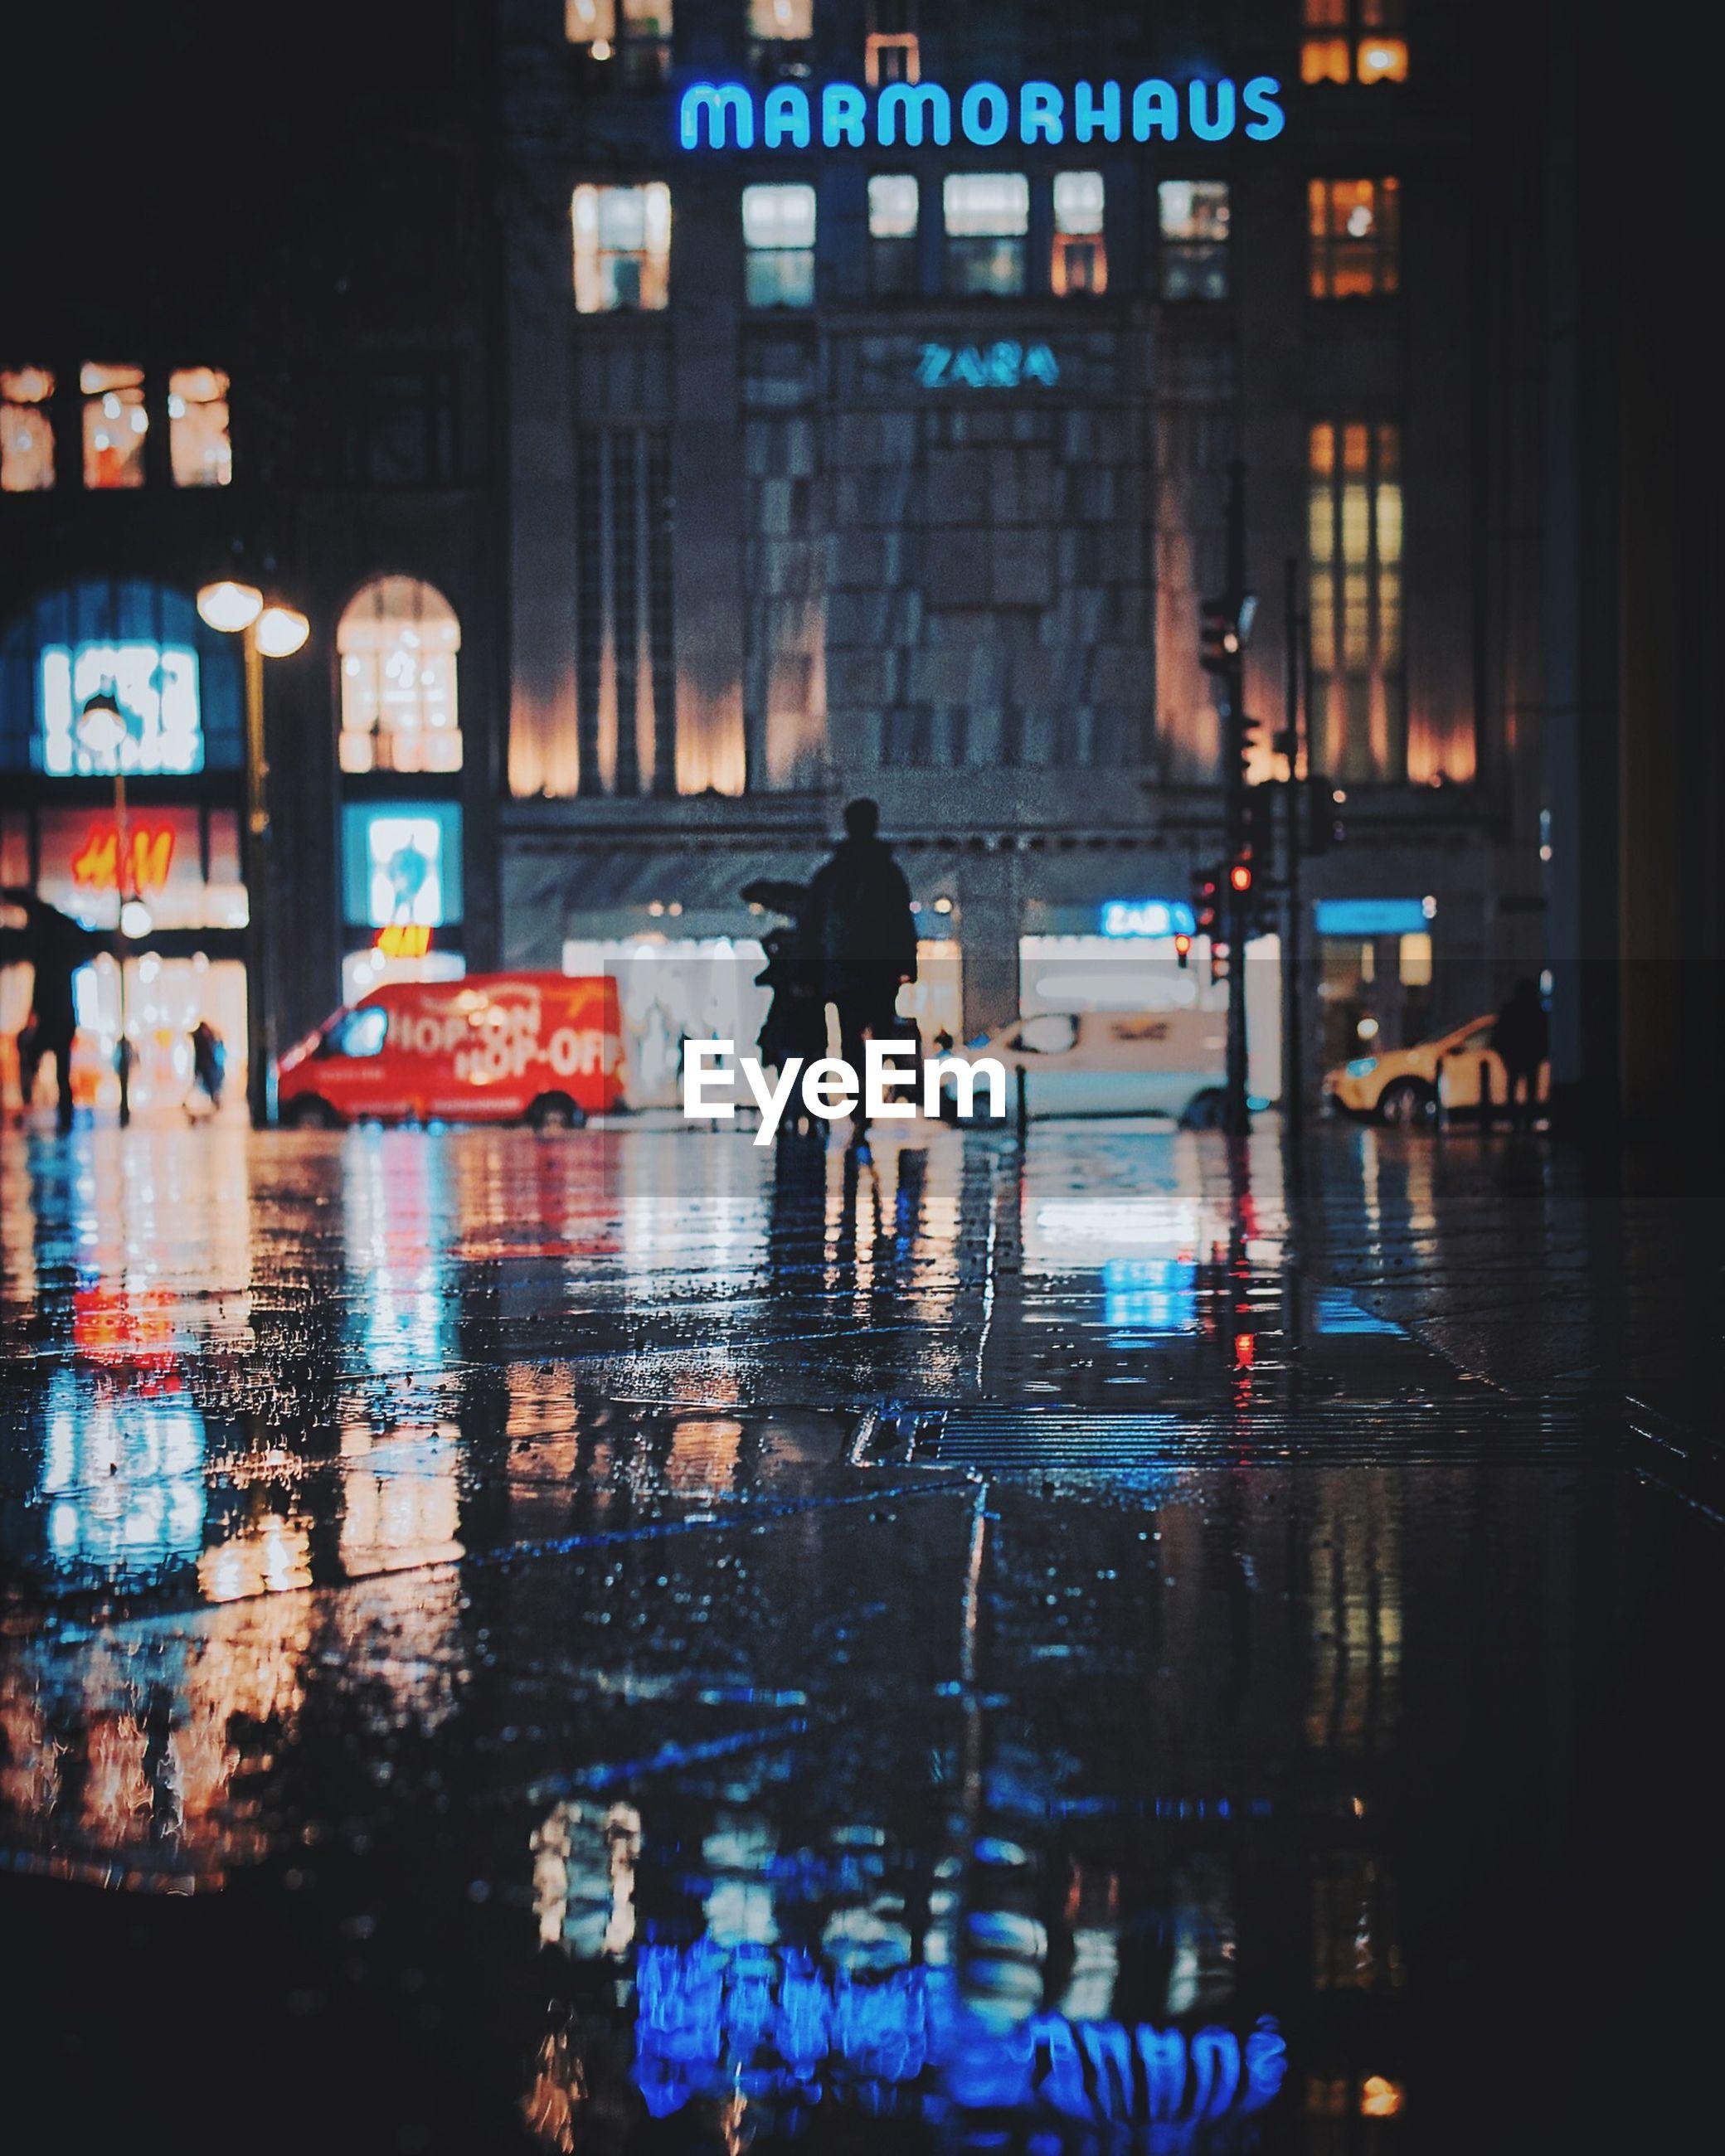 REFLECTION OF MAN WALKING ON WET CITY